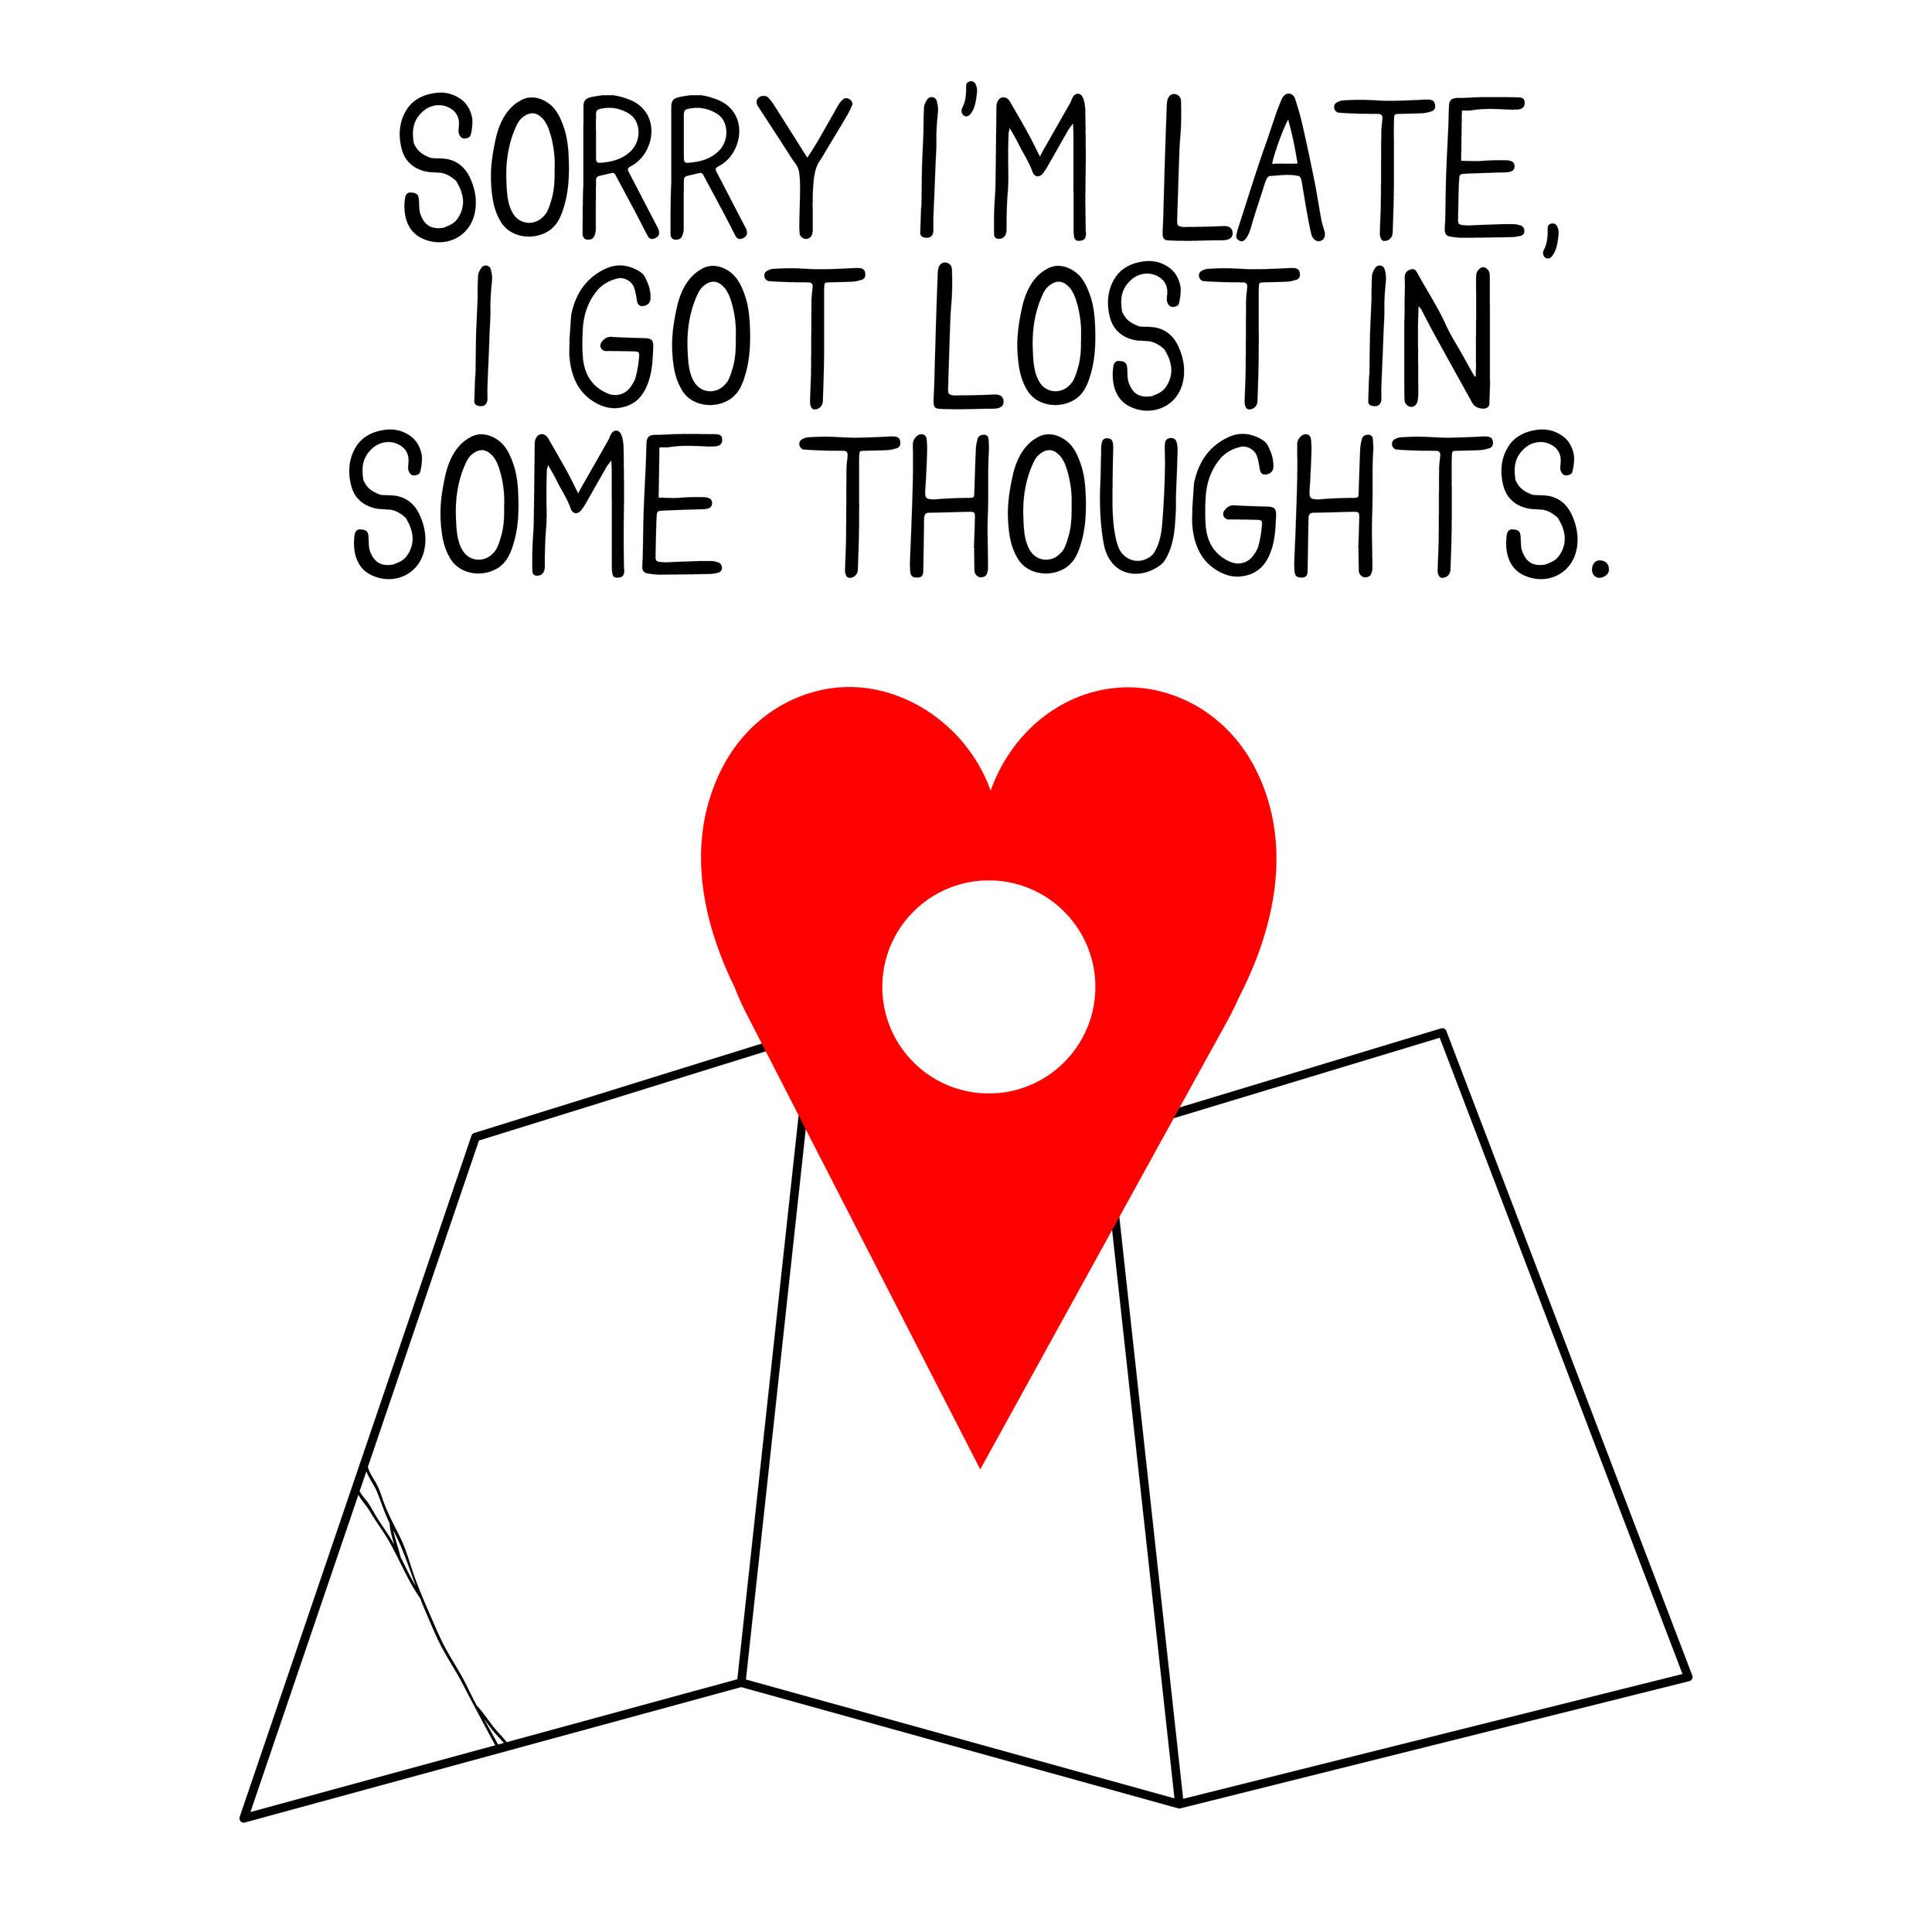 sorryimlate-01.jpg